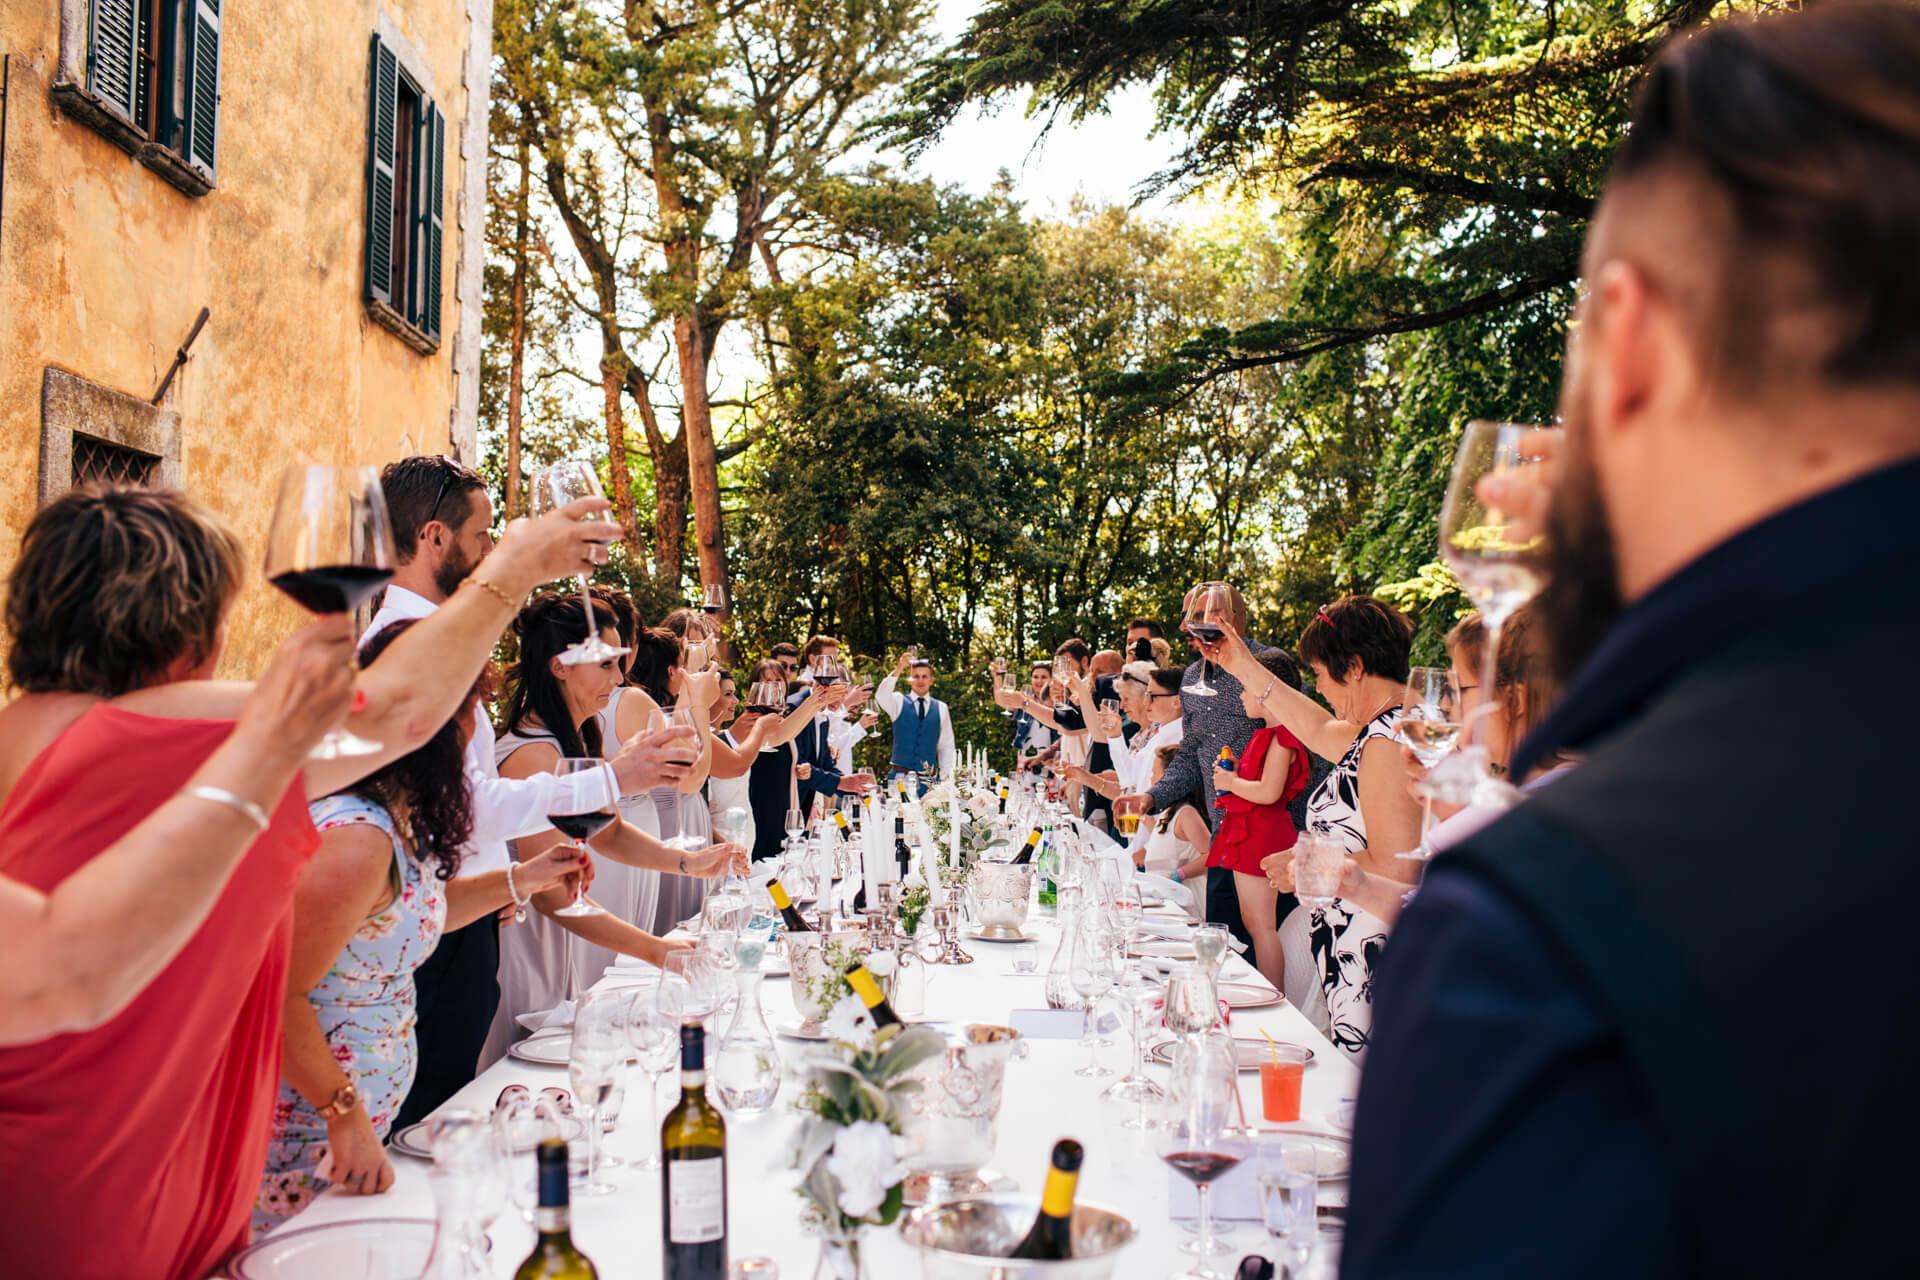 Emily_Little_Photography_Tuscany_Desntination_Wedding_Villa_Di_Ulignano_Italy-58